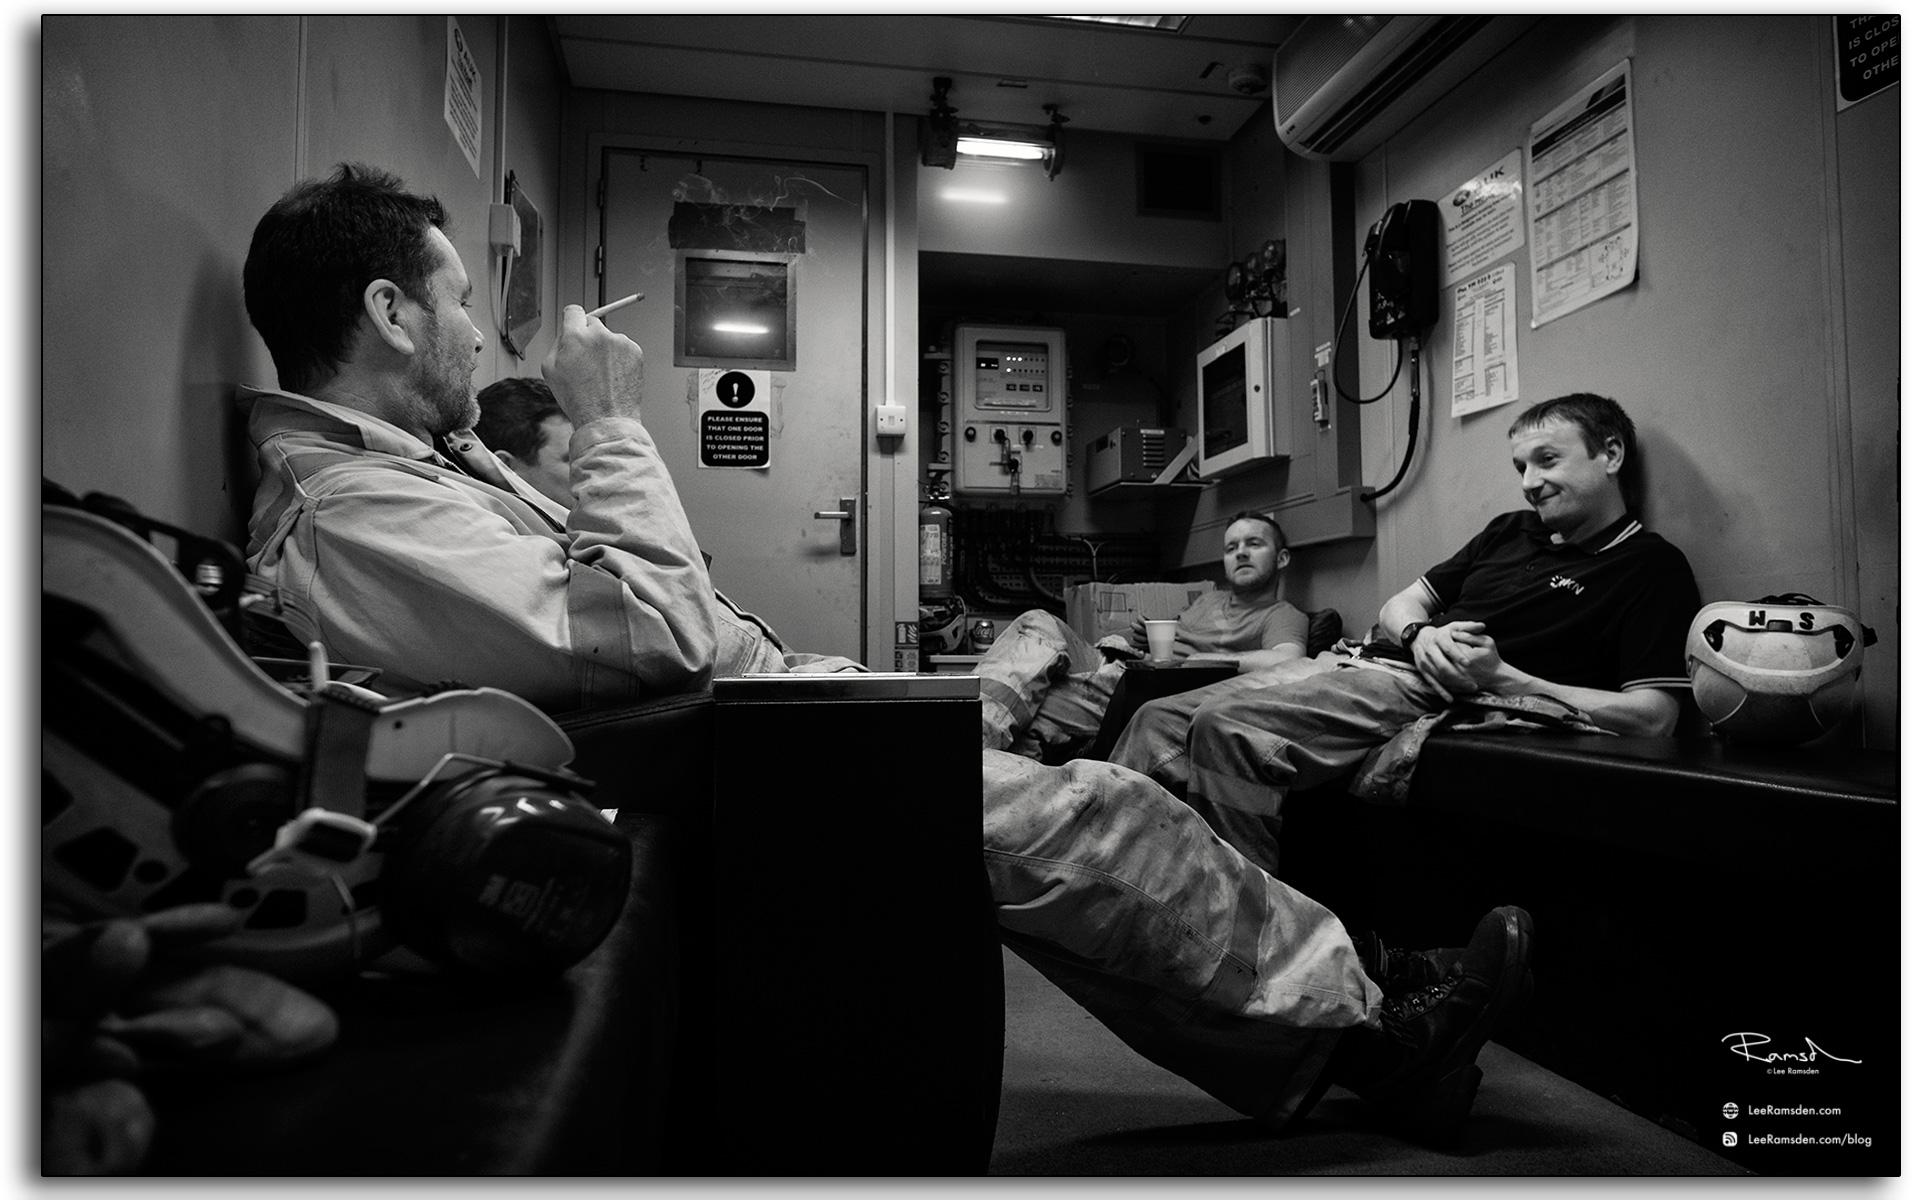 23 Oil and gas workforce on a tea break smoking drinking coffee